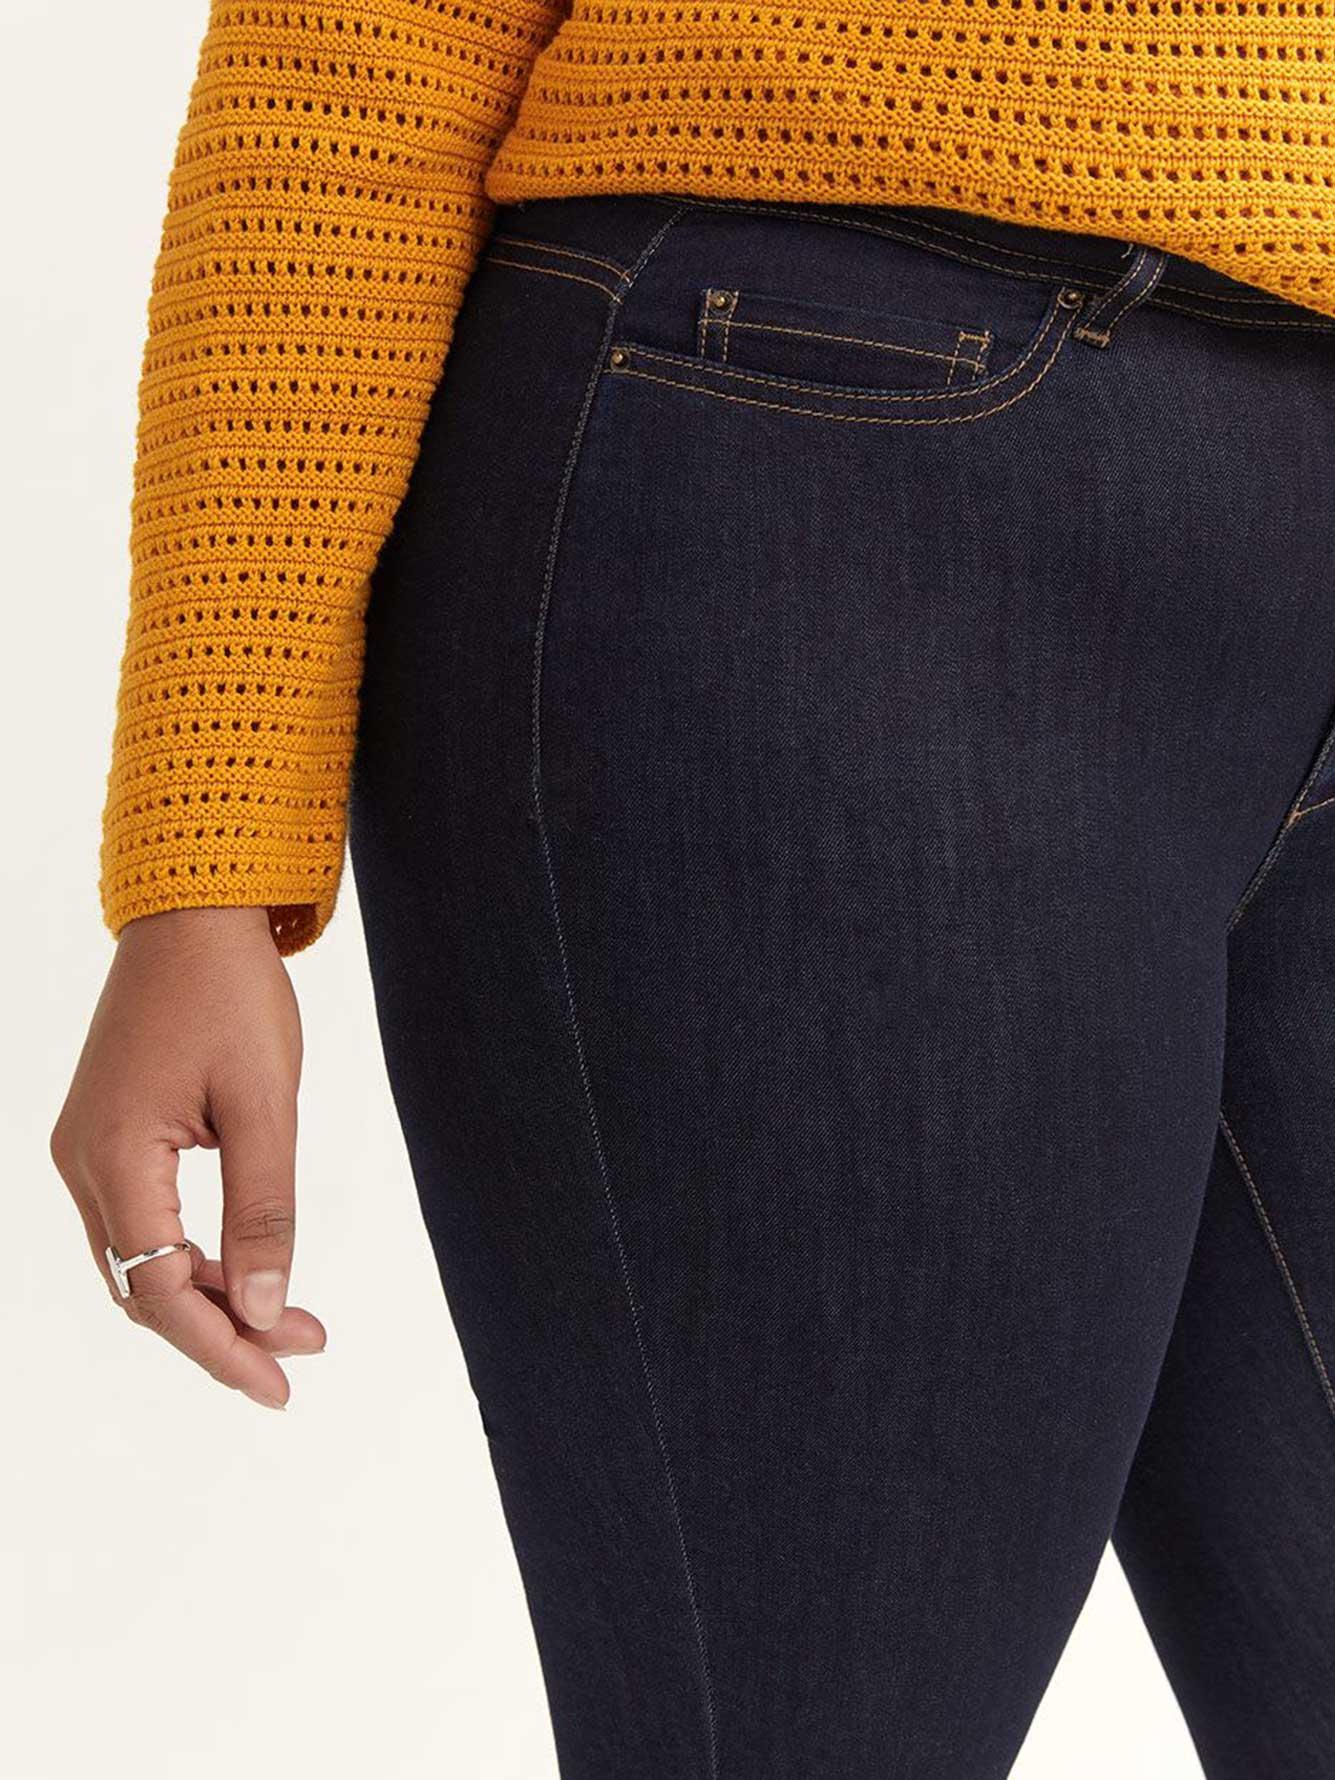 Slightly Curvy, Straight Leg Jean - d/c JEANS